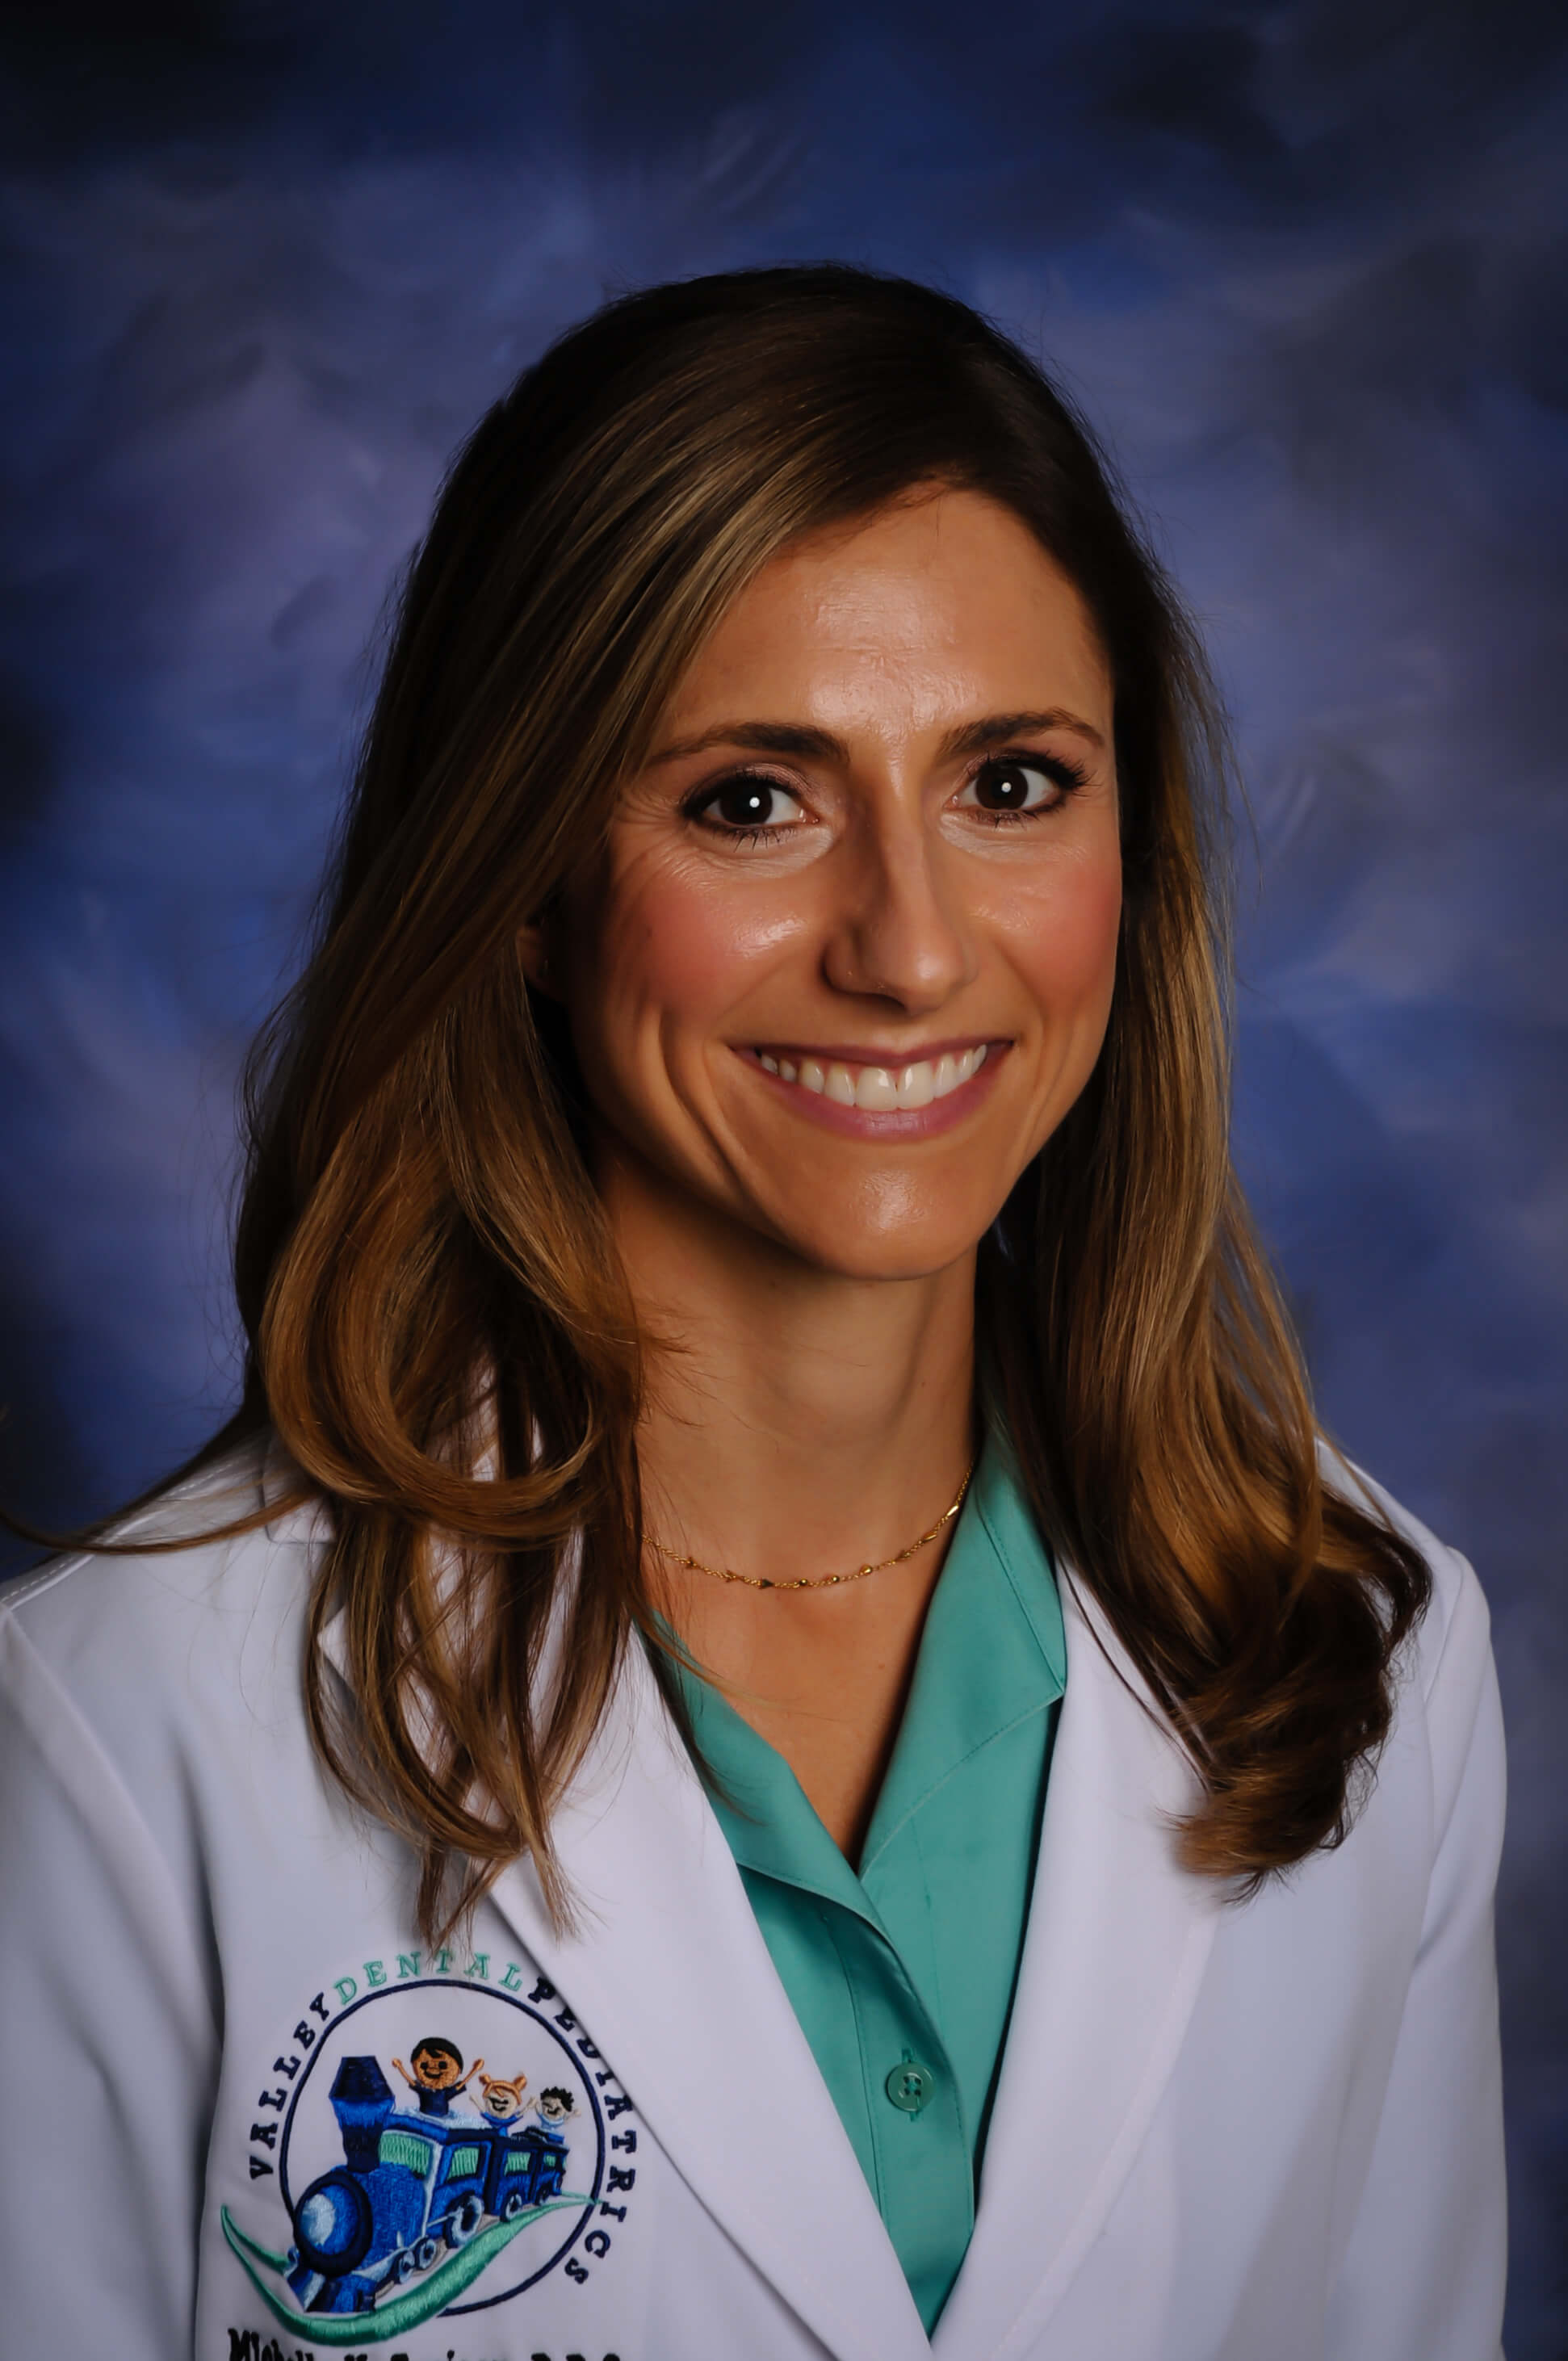 Dr. Michelle Tunison, DDS